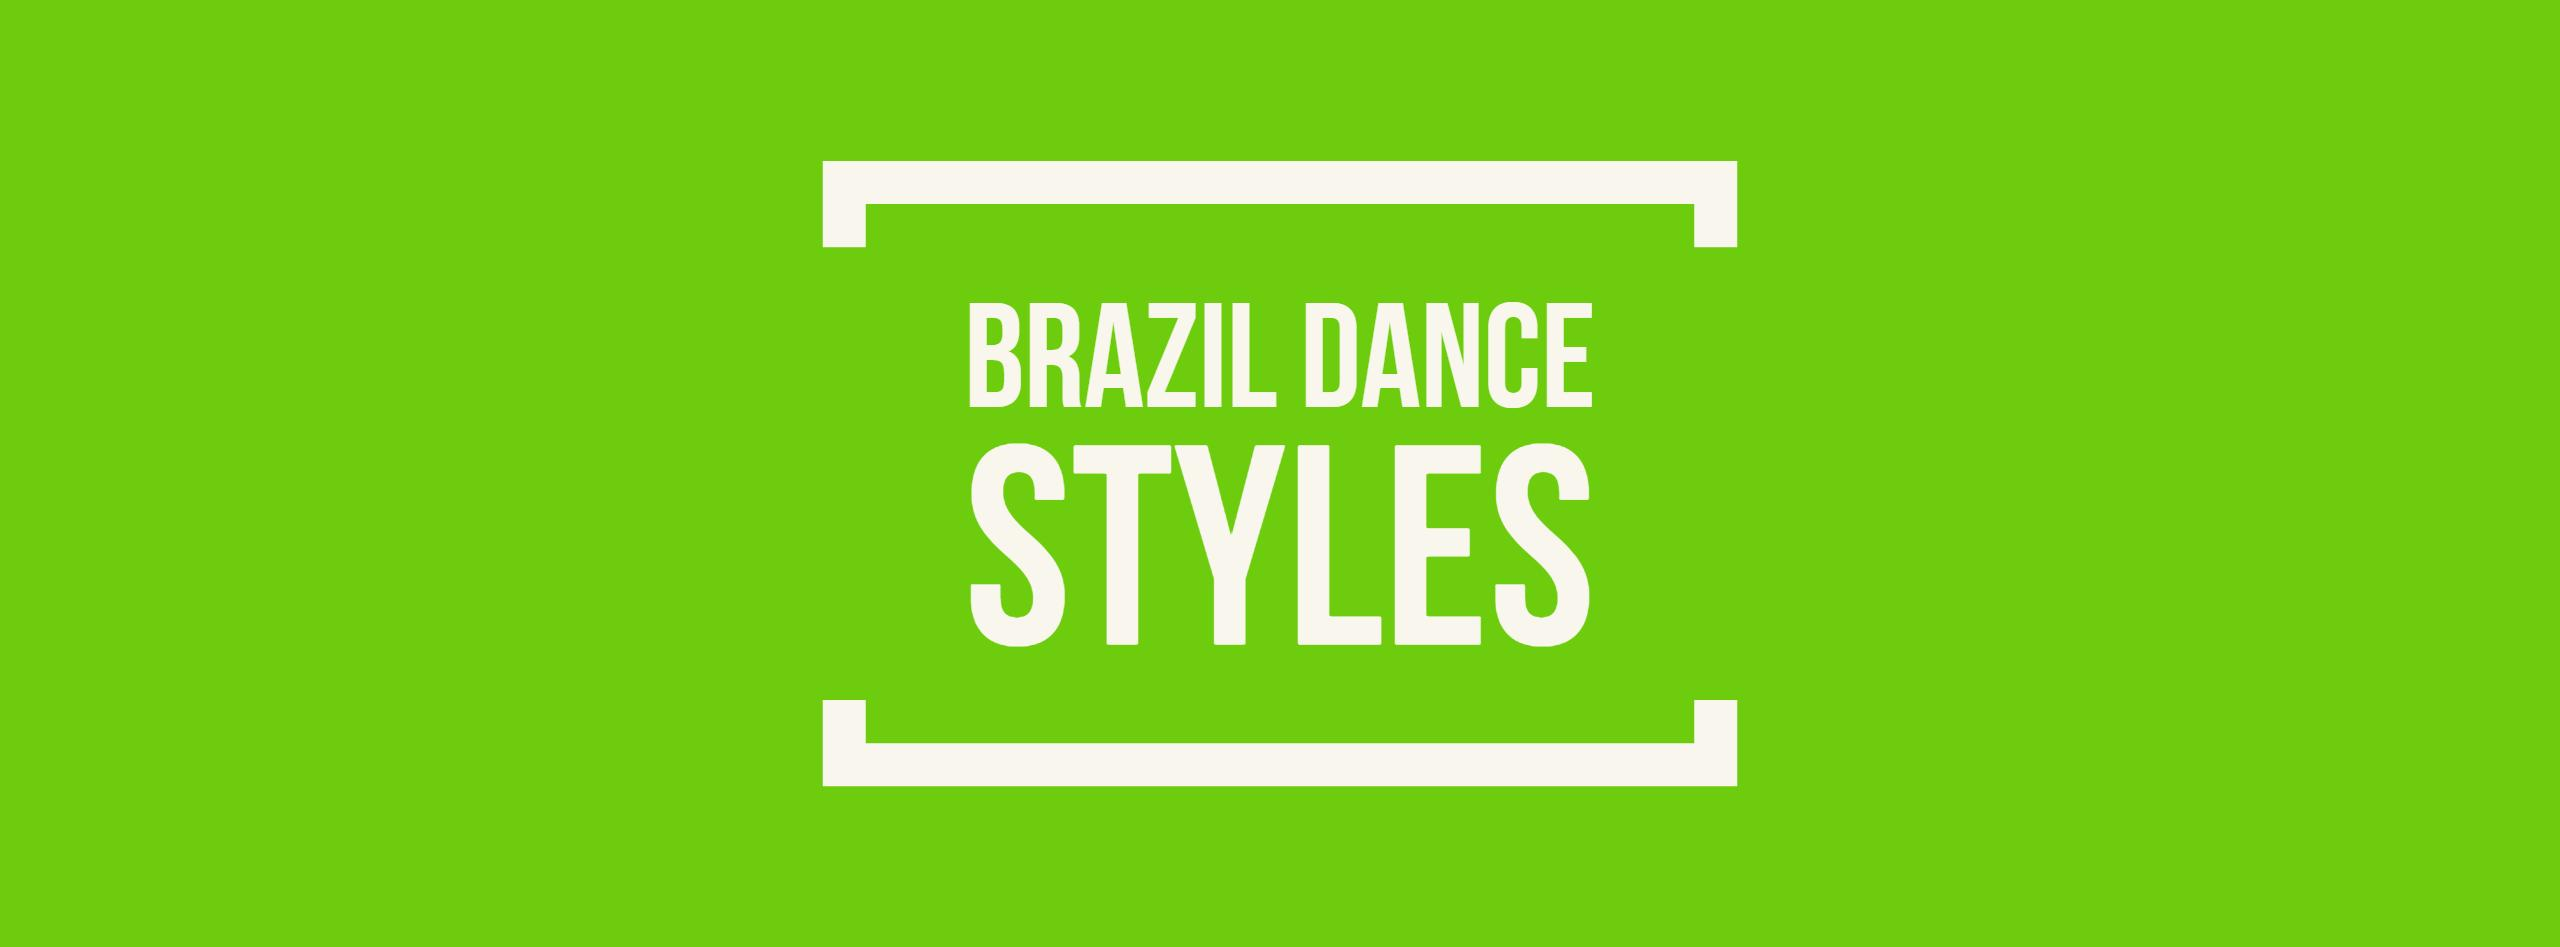 Brazil Dance Styles